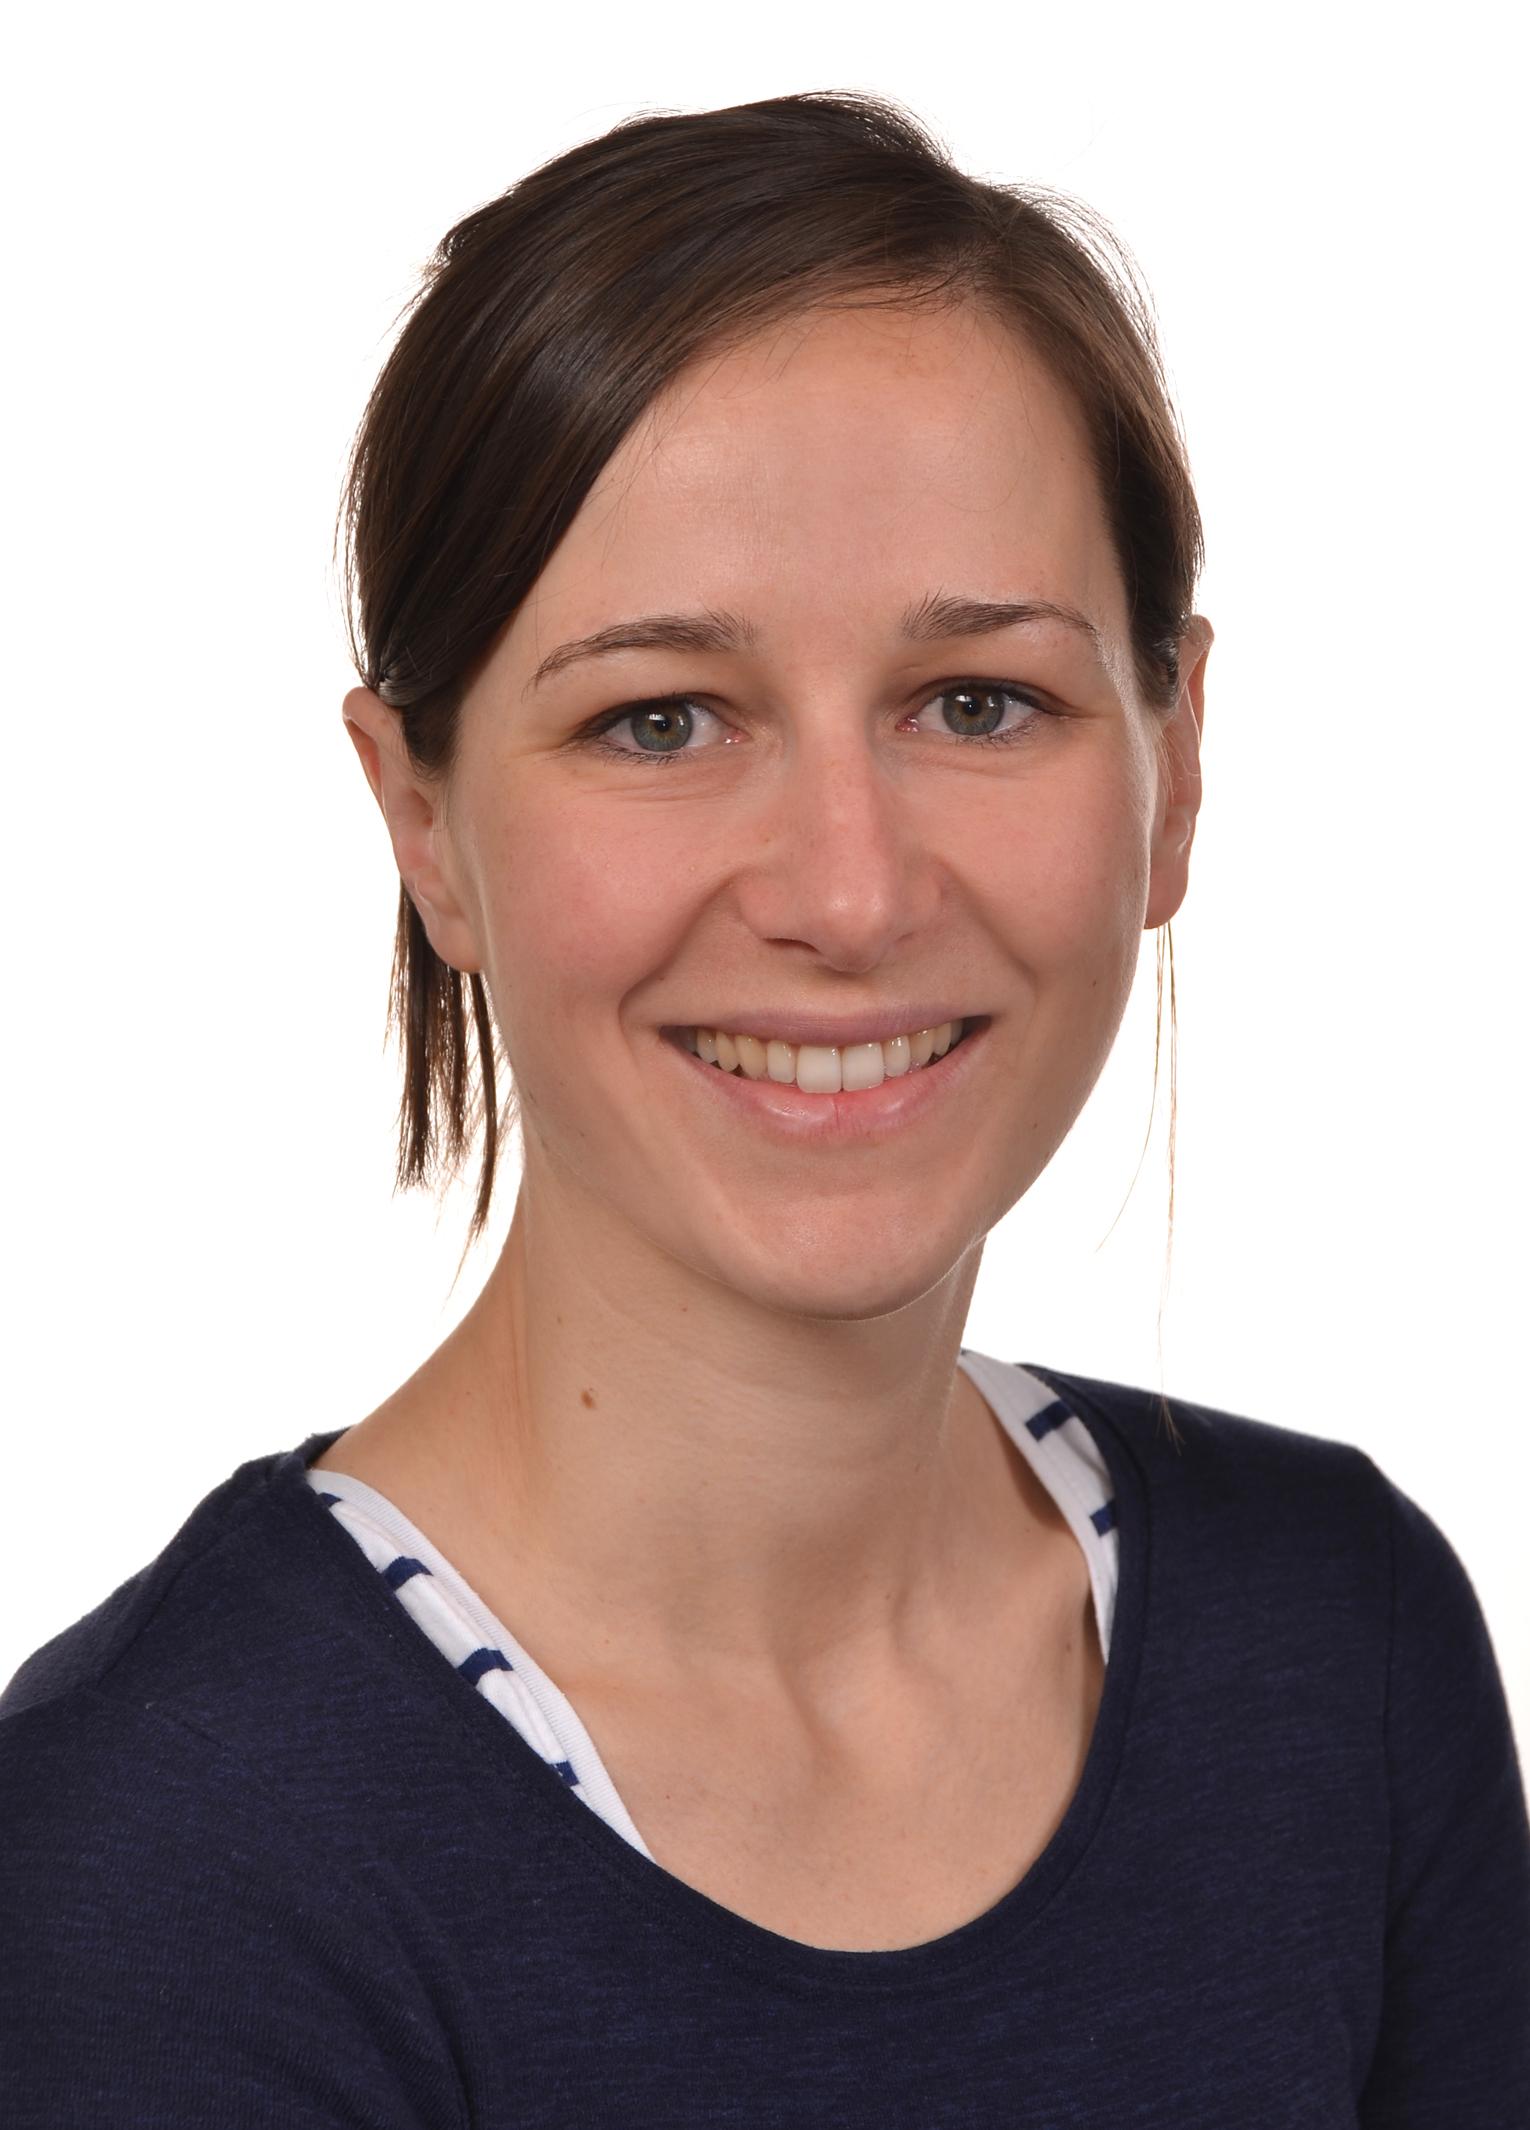 Sarah Partenheimer